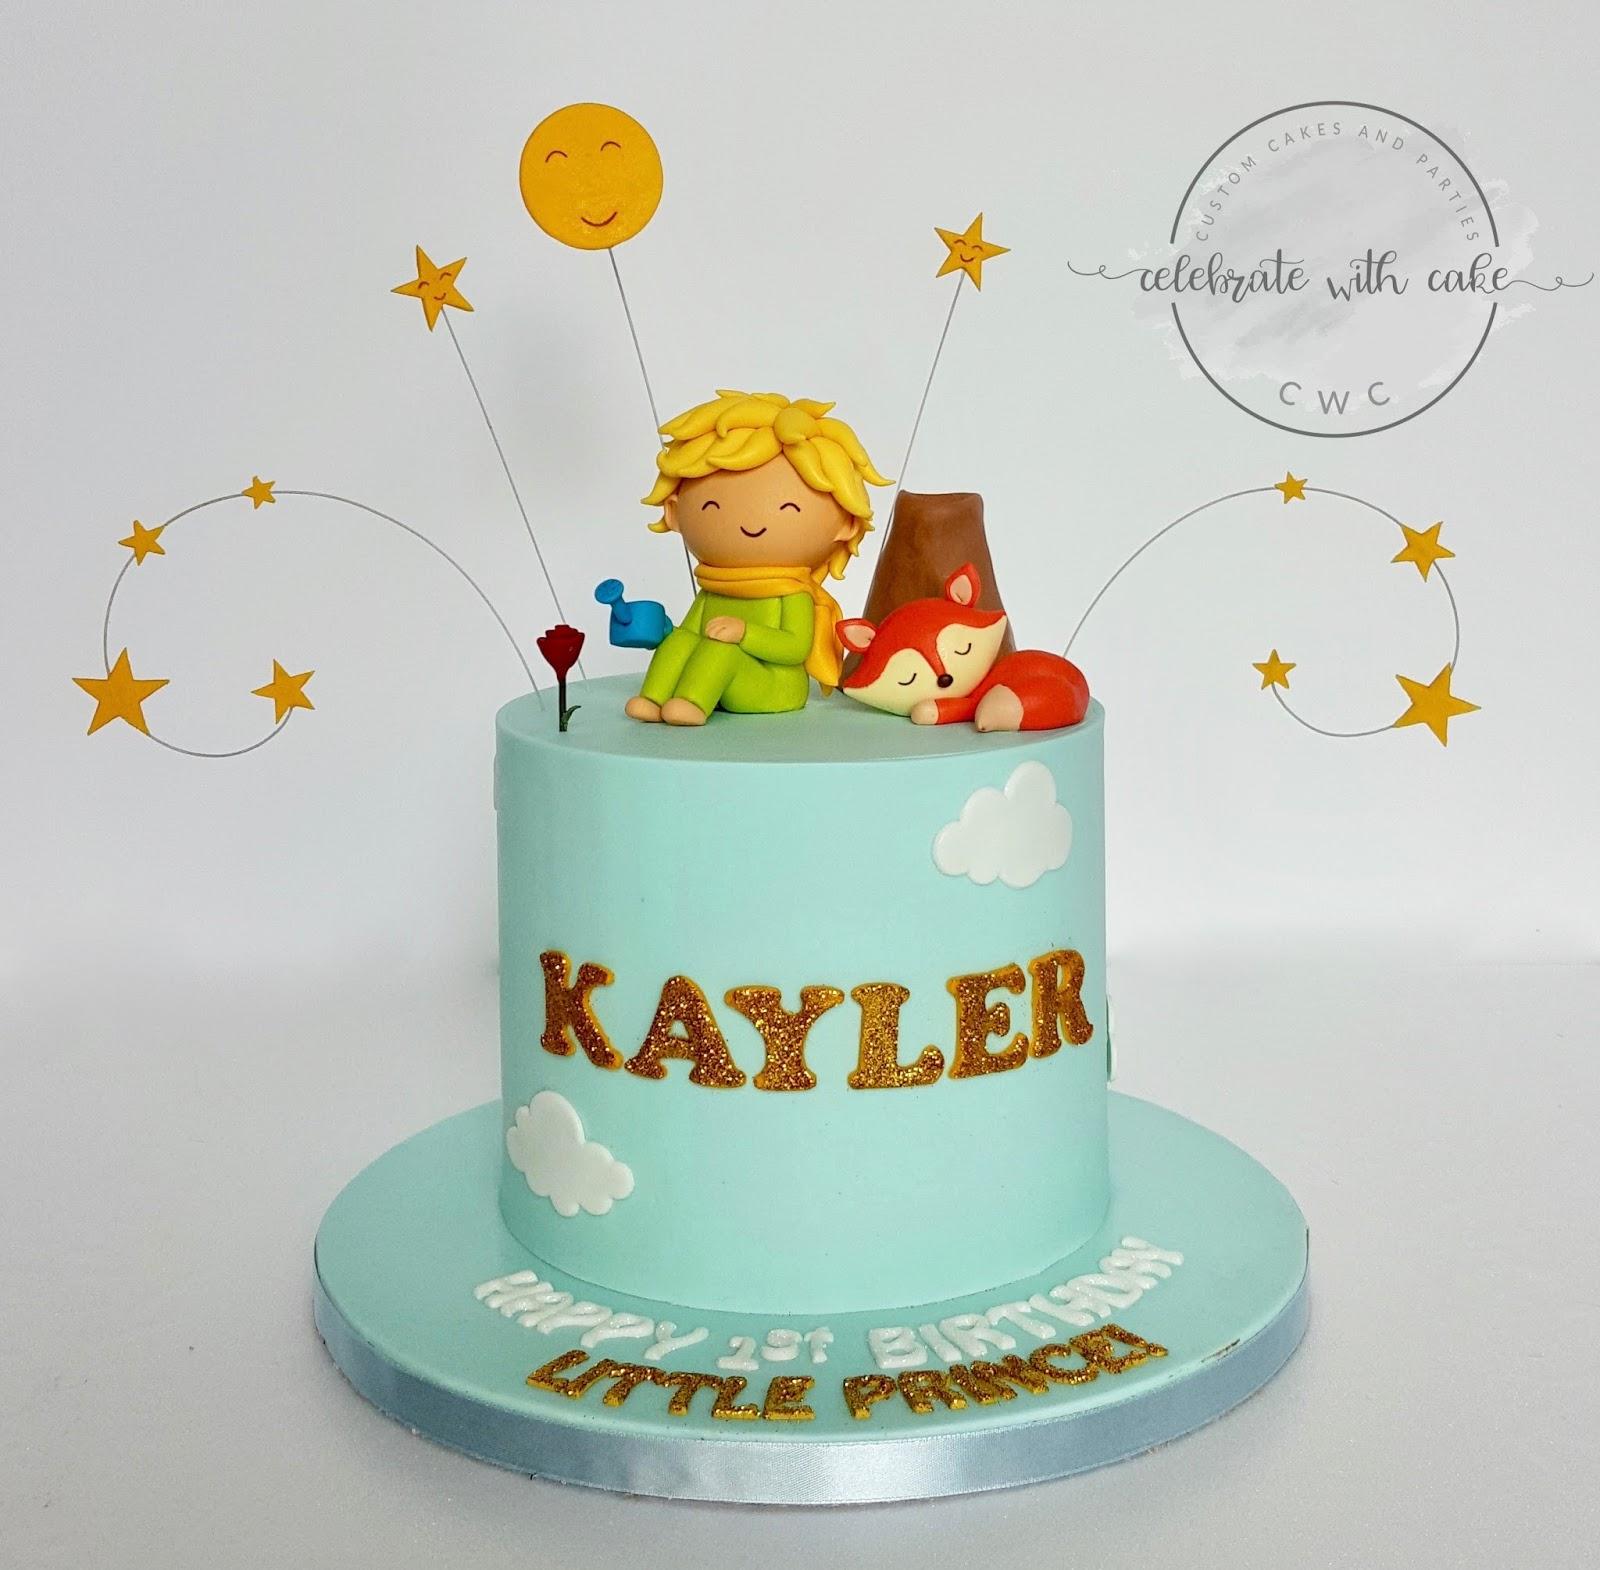 Awe Inspiring Celebrate With Cake The Little Prince 1St Birthday Cake Personalised Birthday Cards Bromeletsinfo